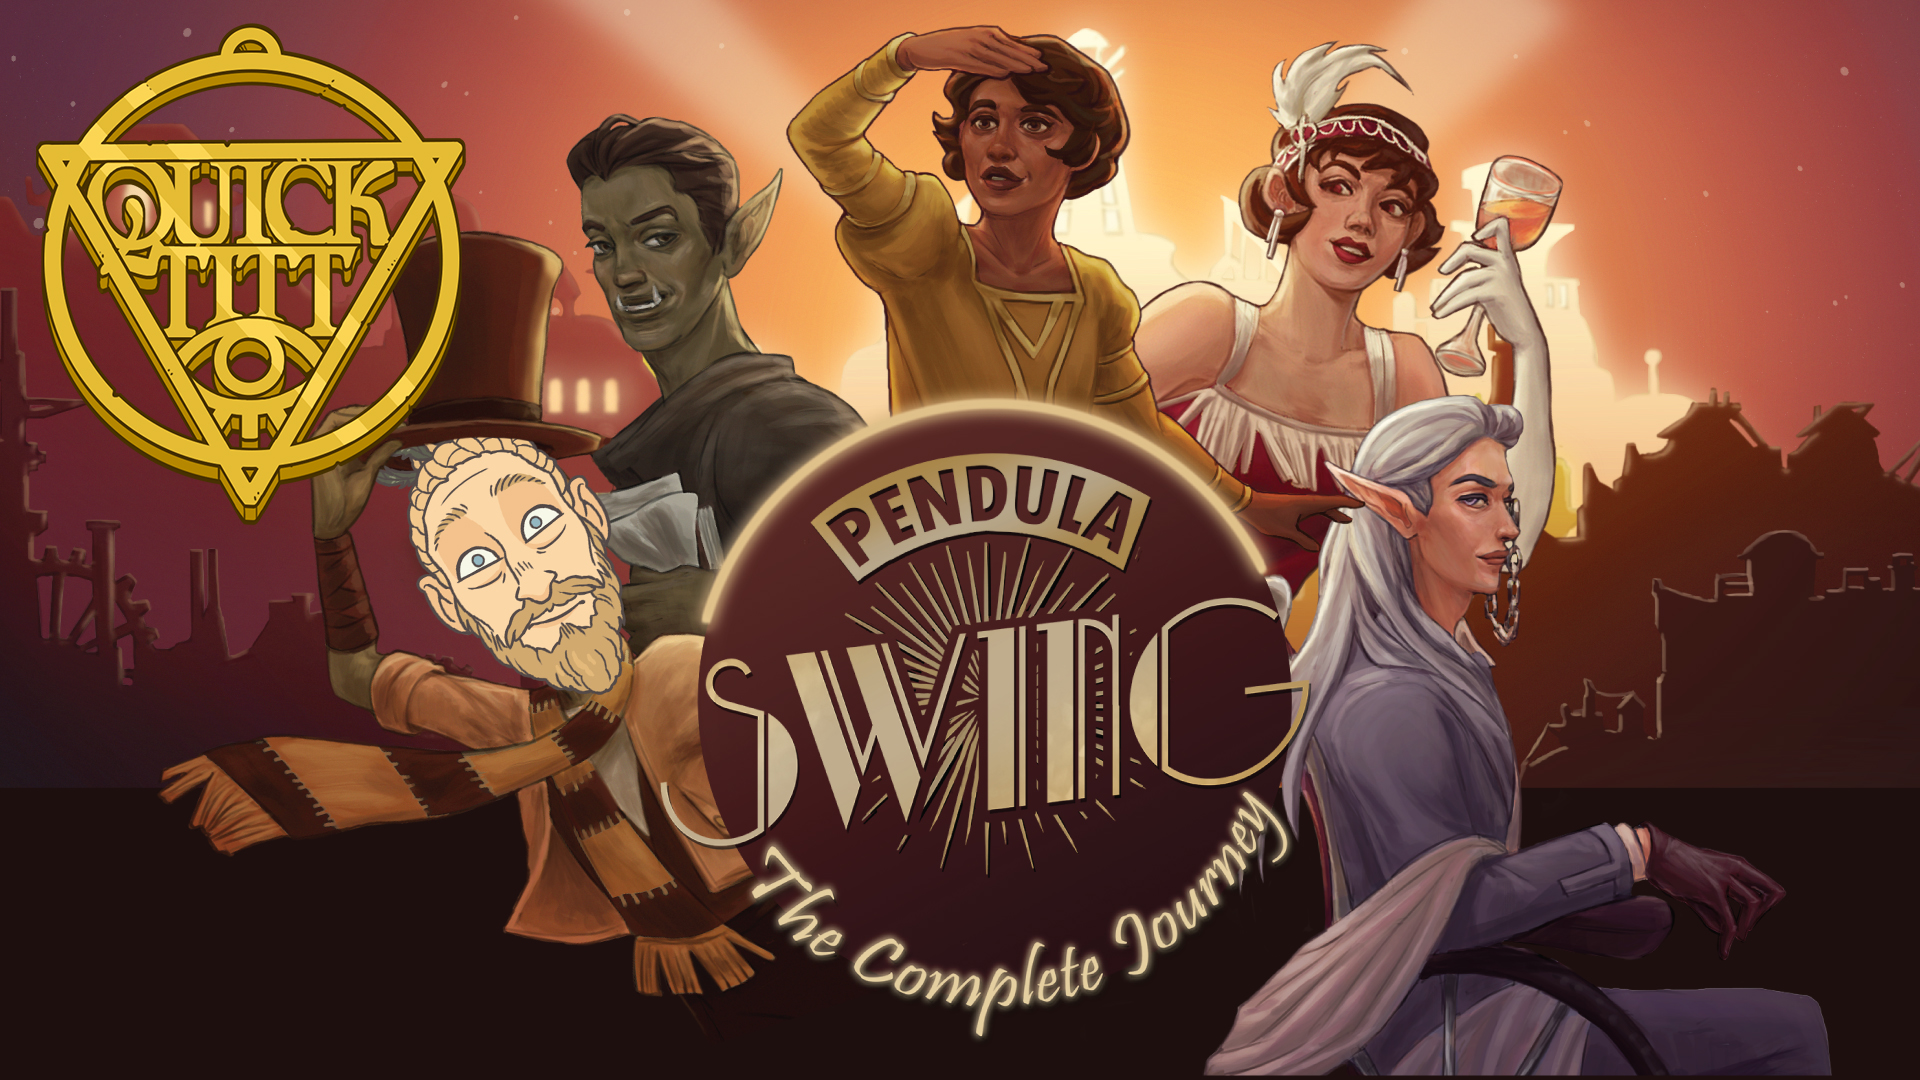 Pendula Swing: The Complete Journey (PC)